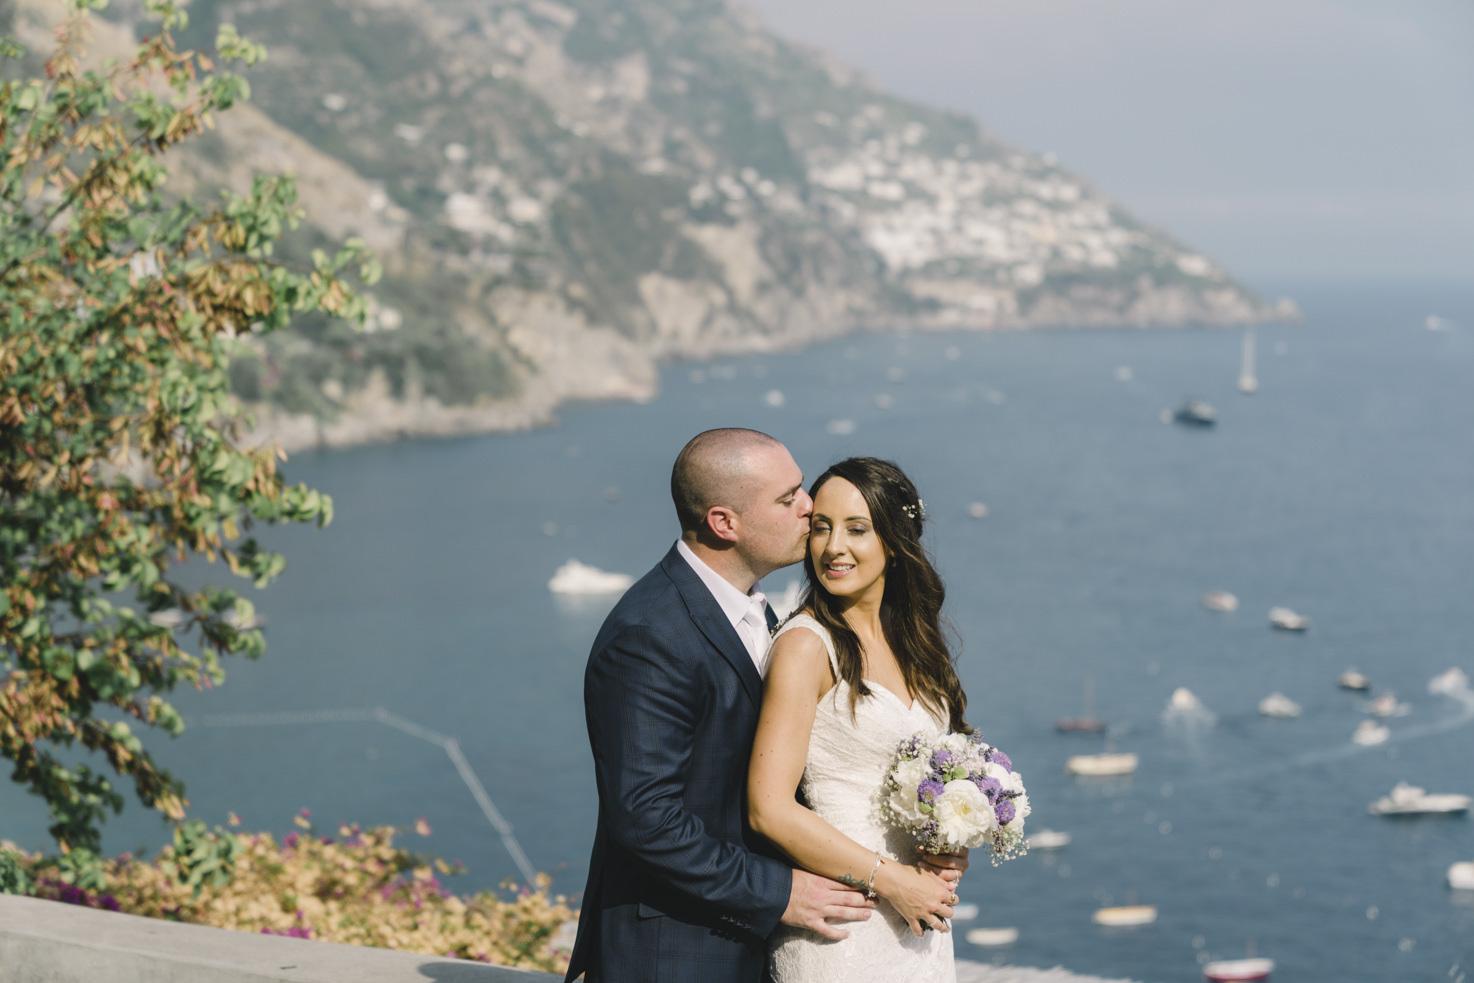 Newlyweds in Positano